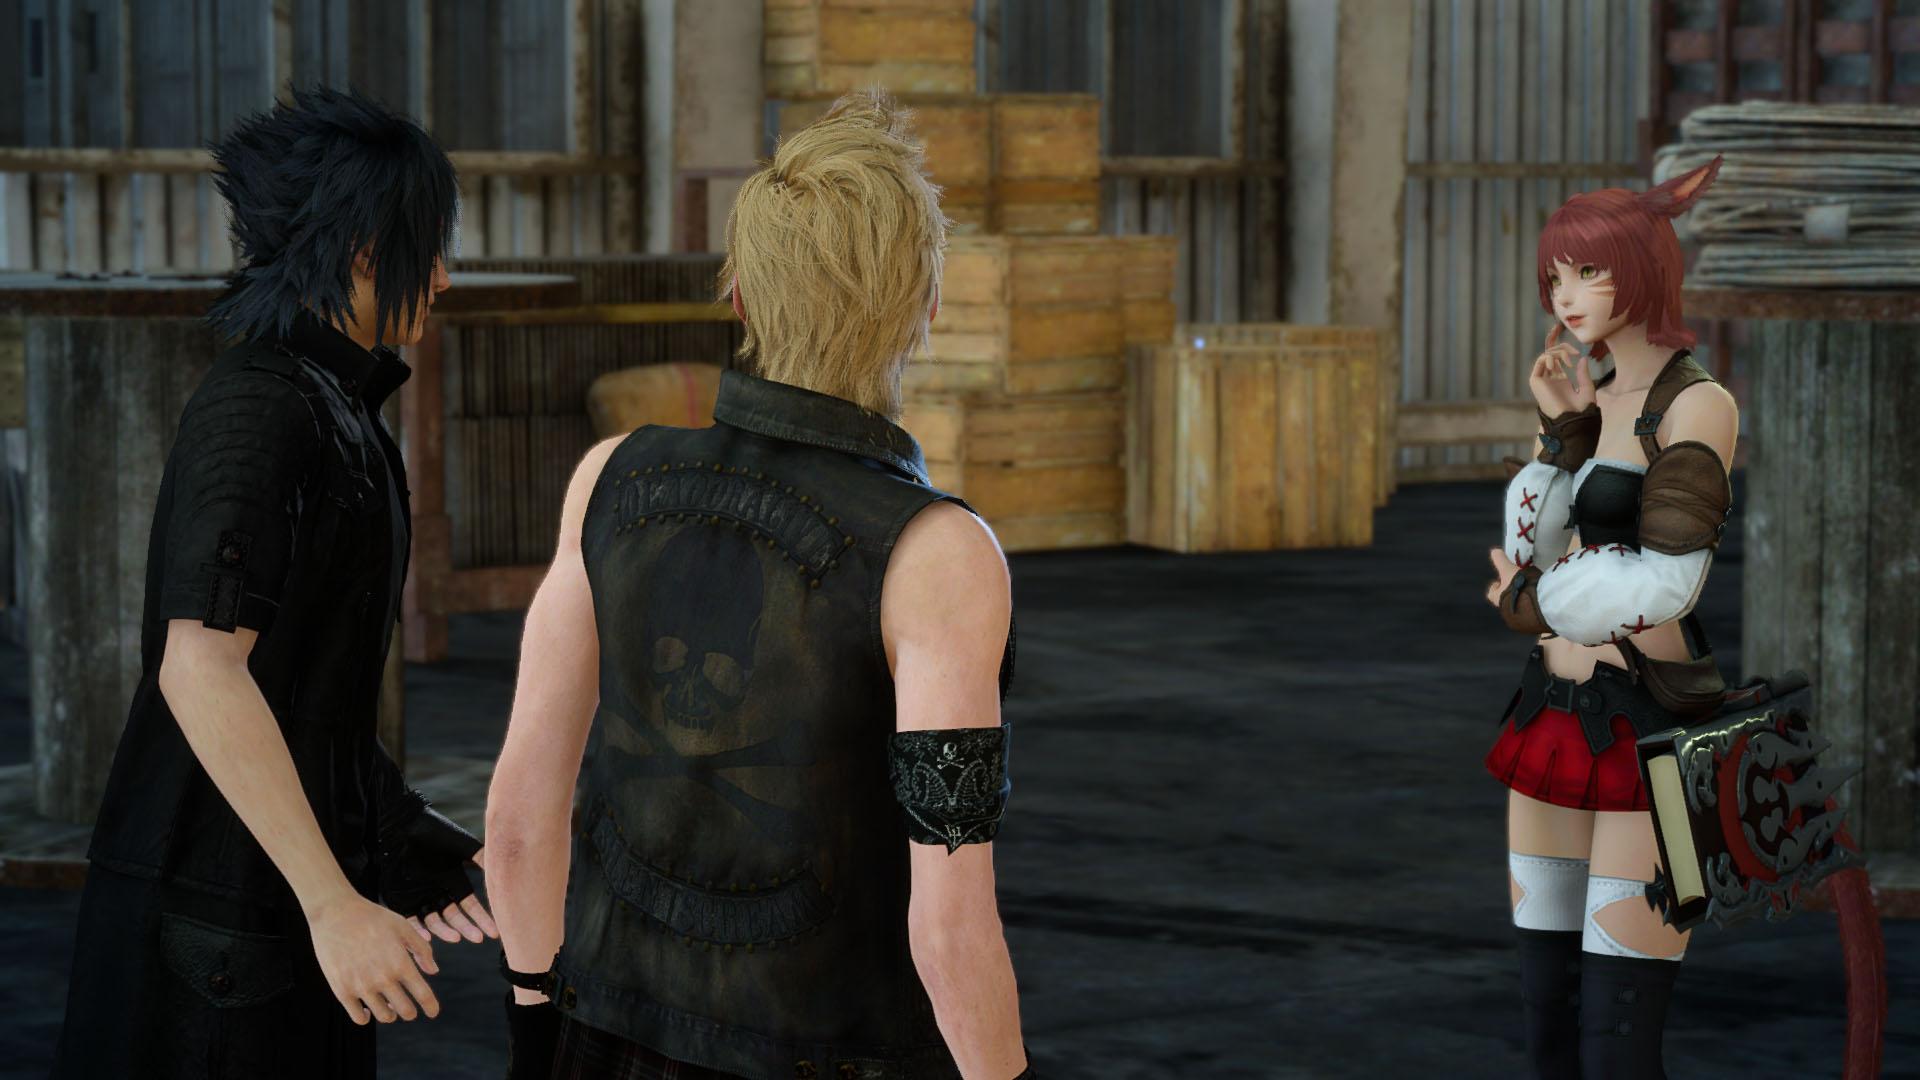 Final Fantasy XV X Final Fantasy XIV Online Collaboration